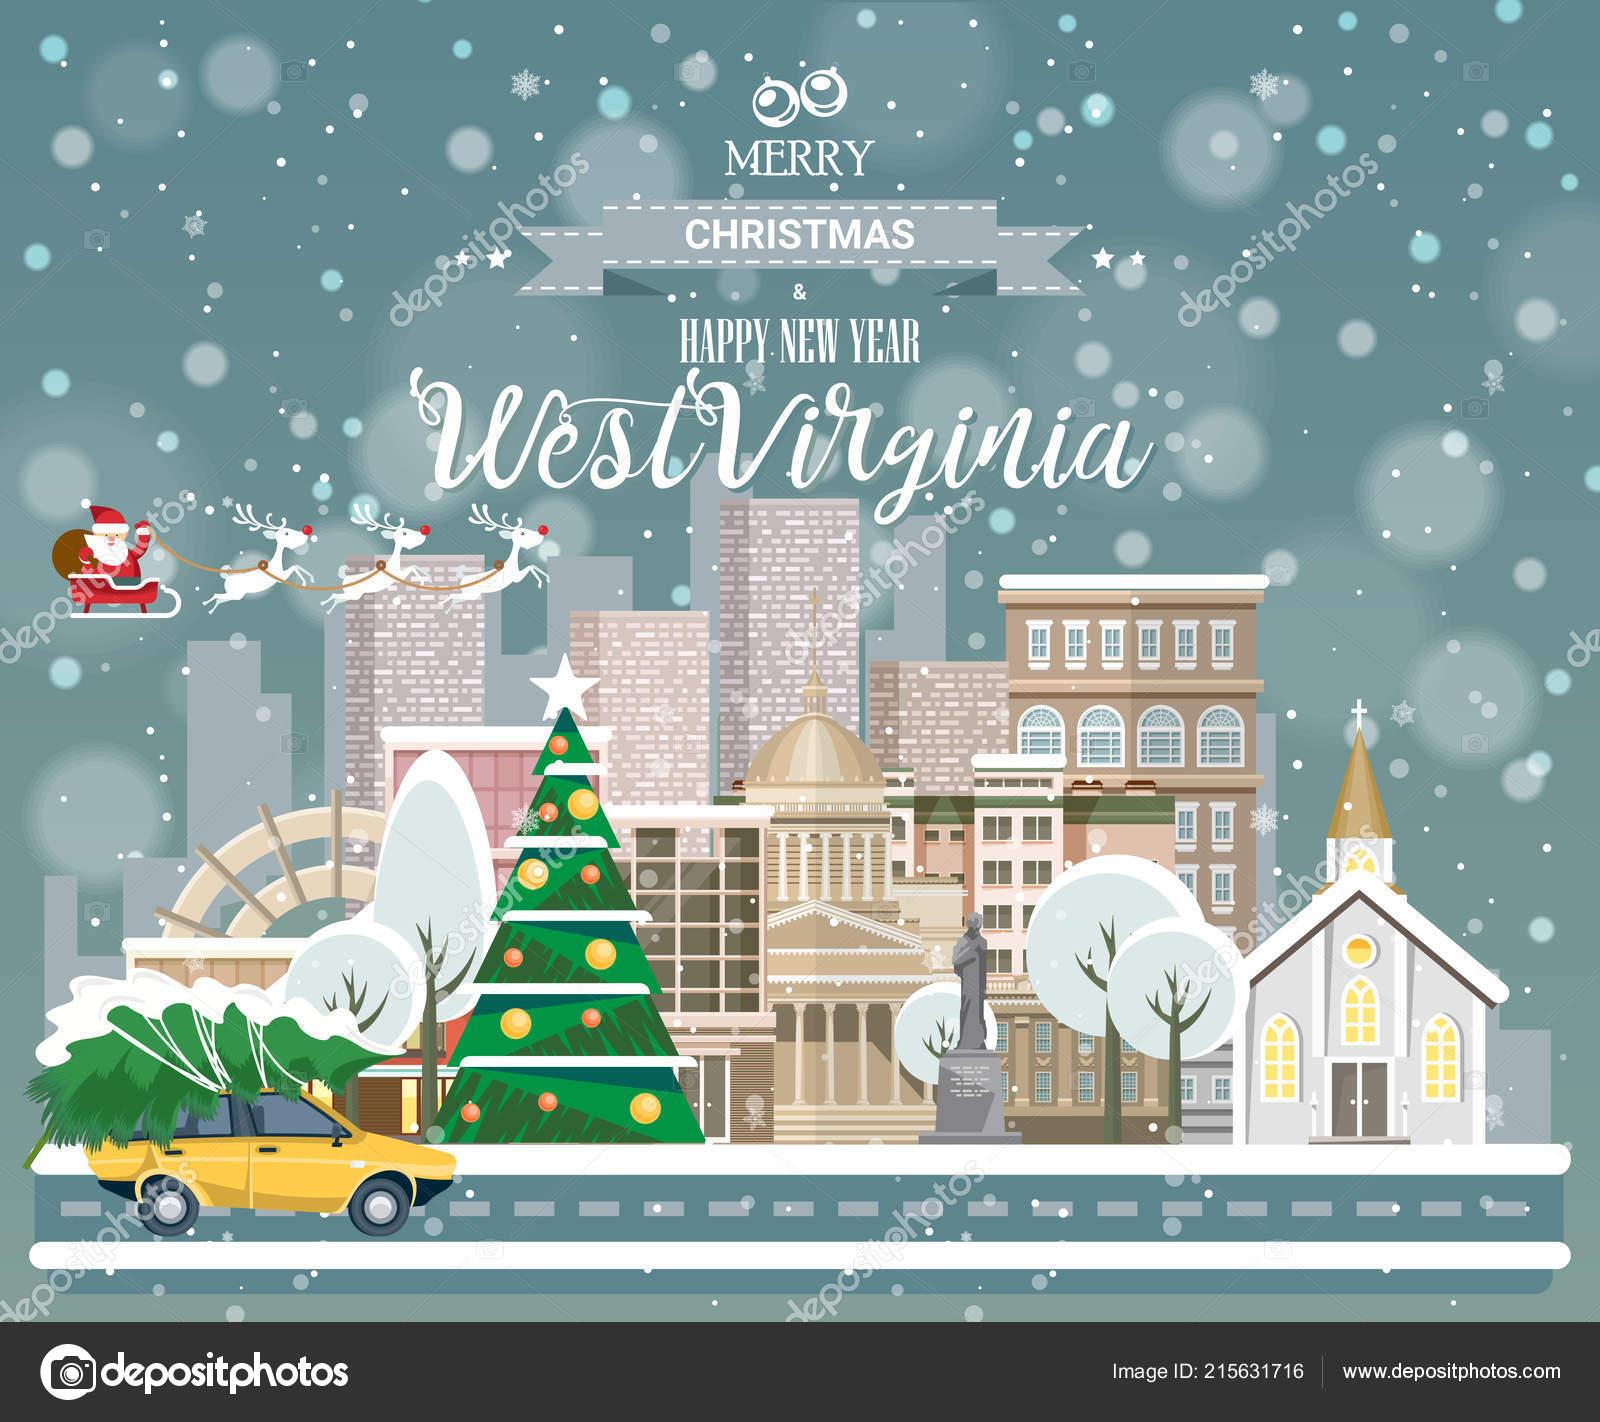 Merry Christmas Happy New Year West Virginia Greeting Festive Card ...